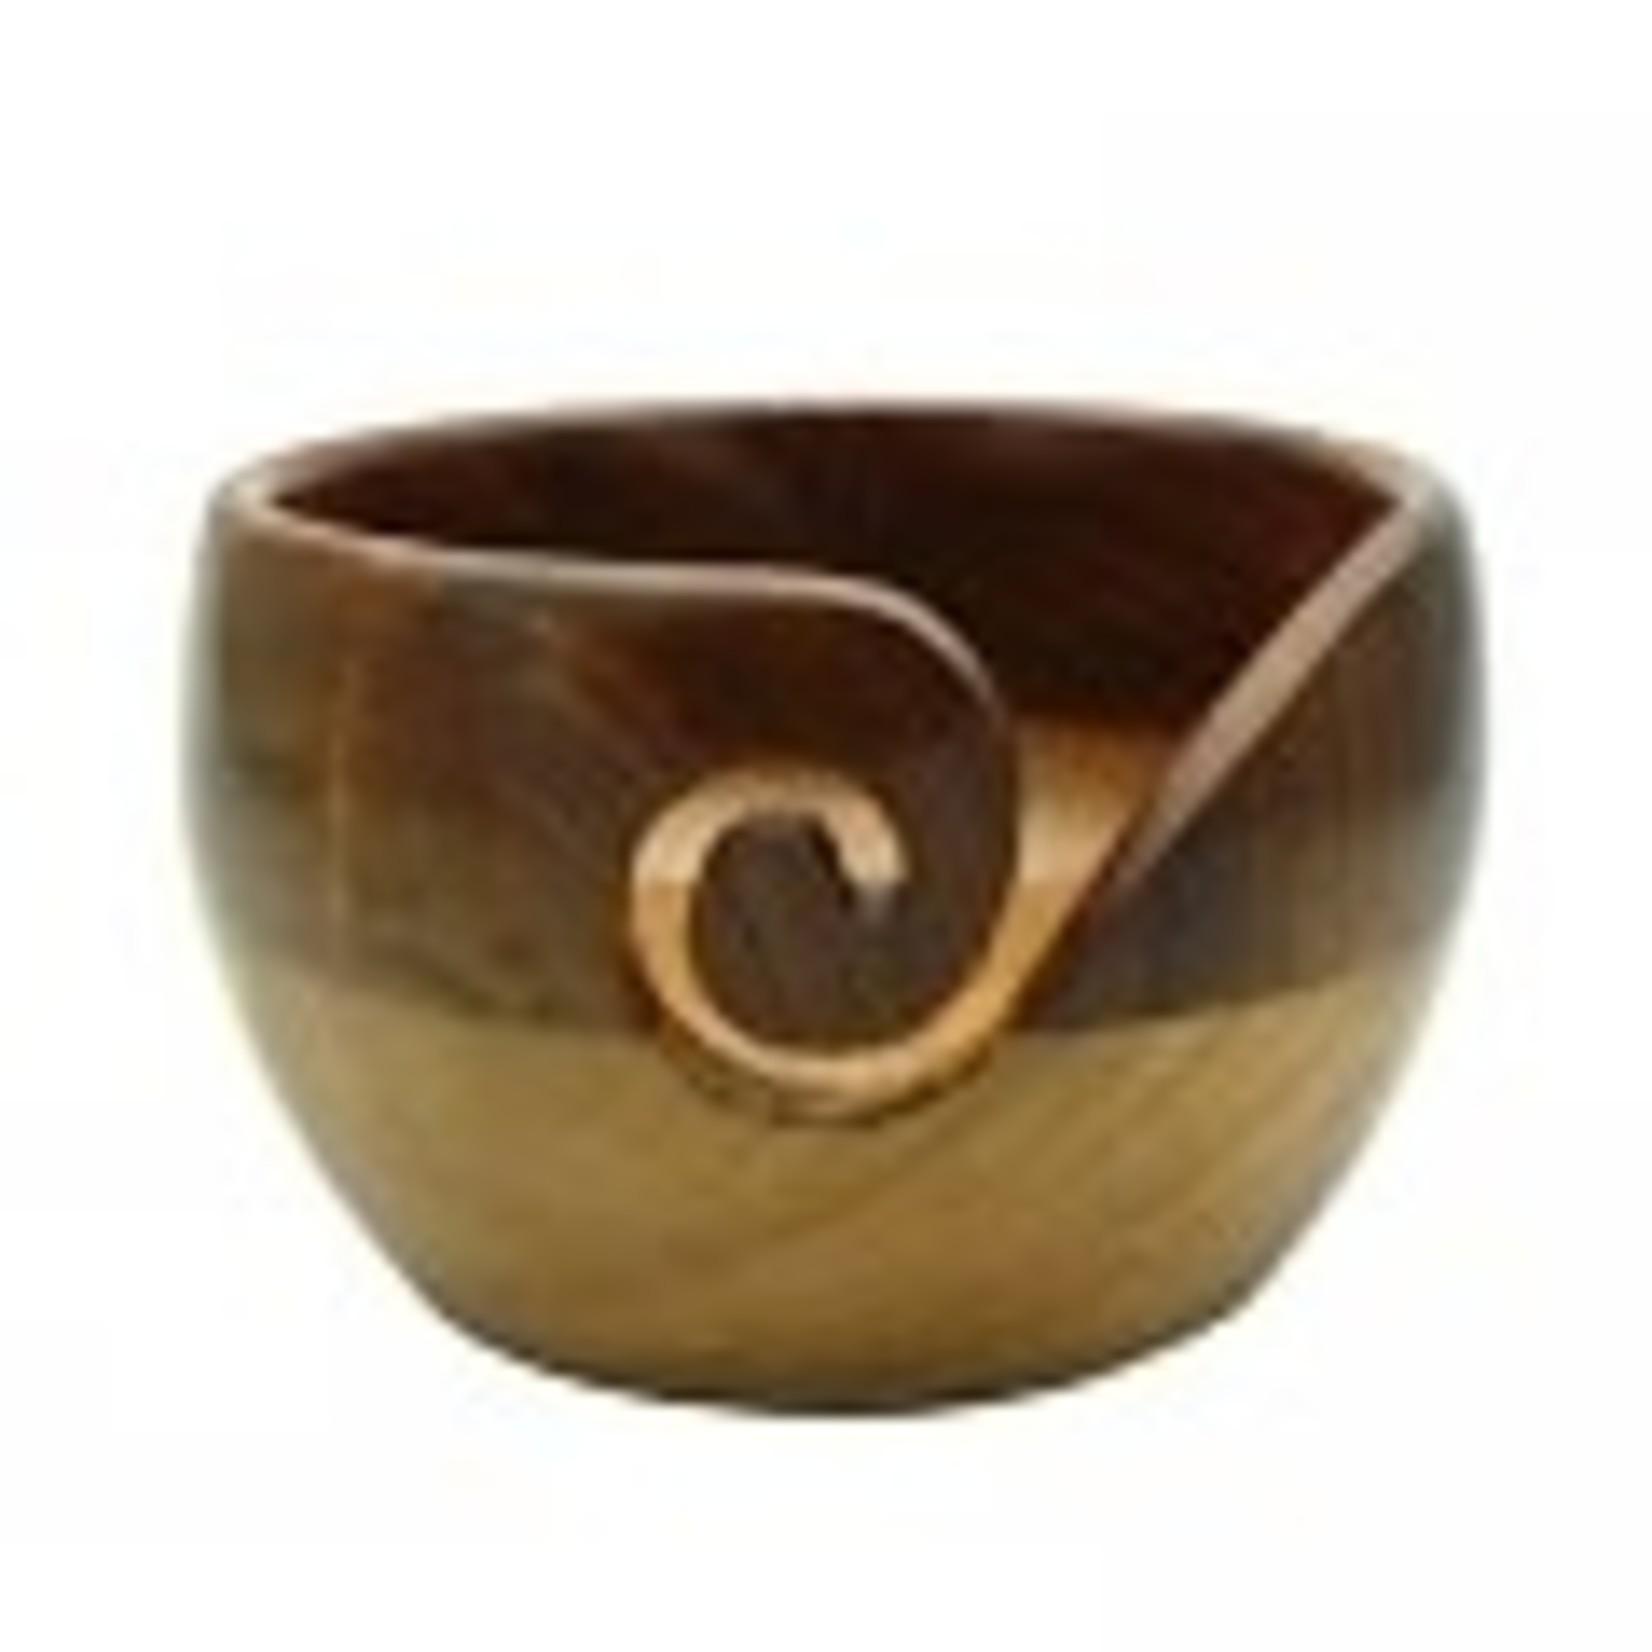 Estelle Yarn Bowl by Estelle